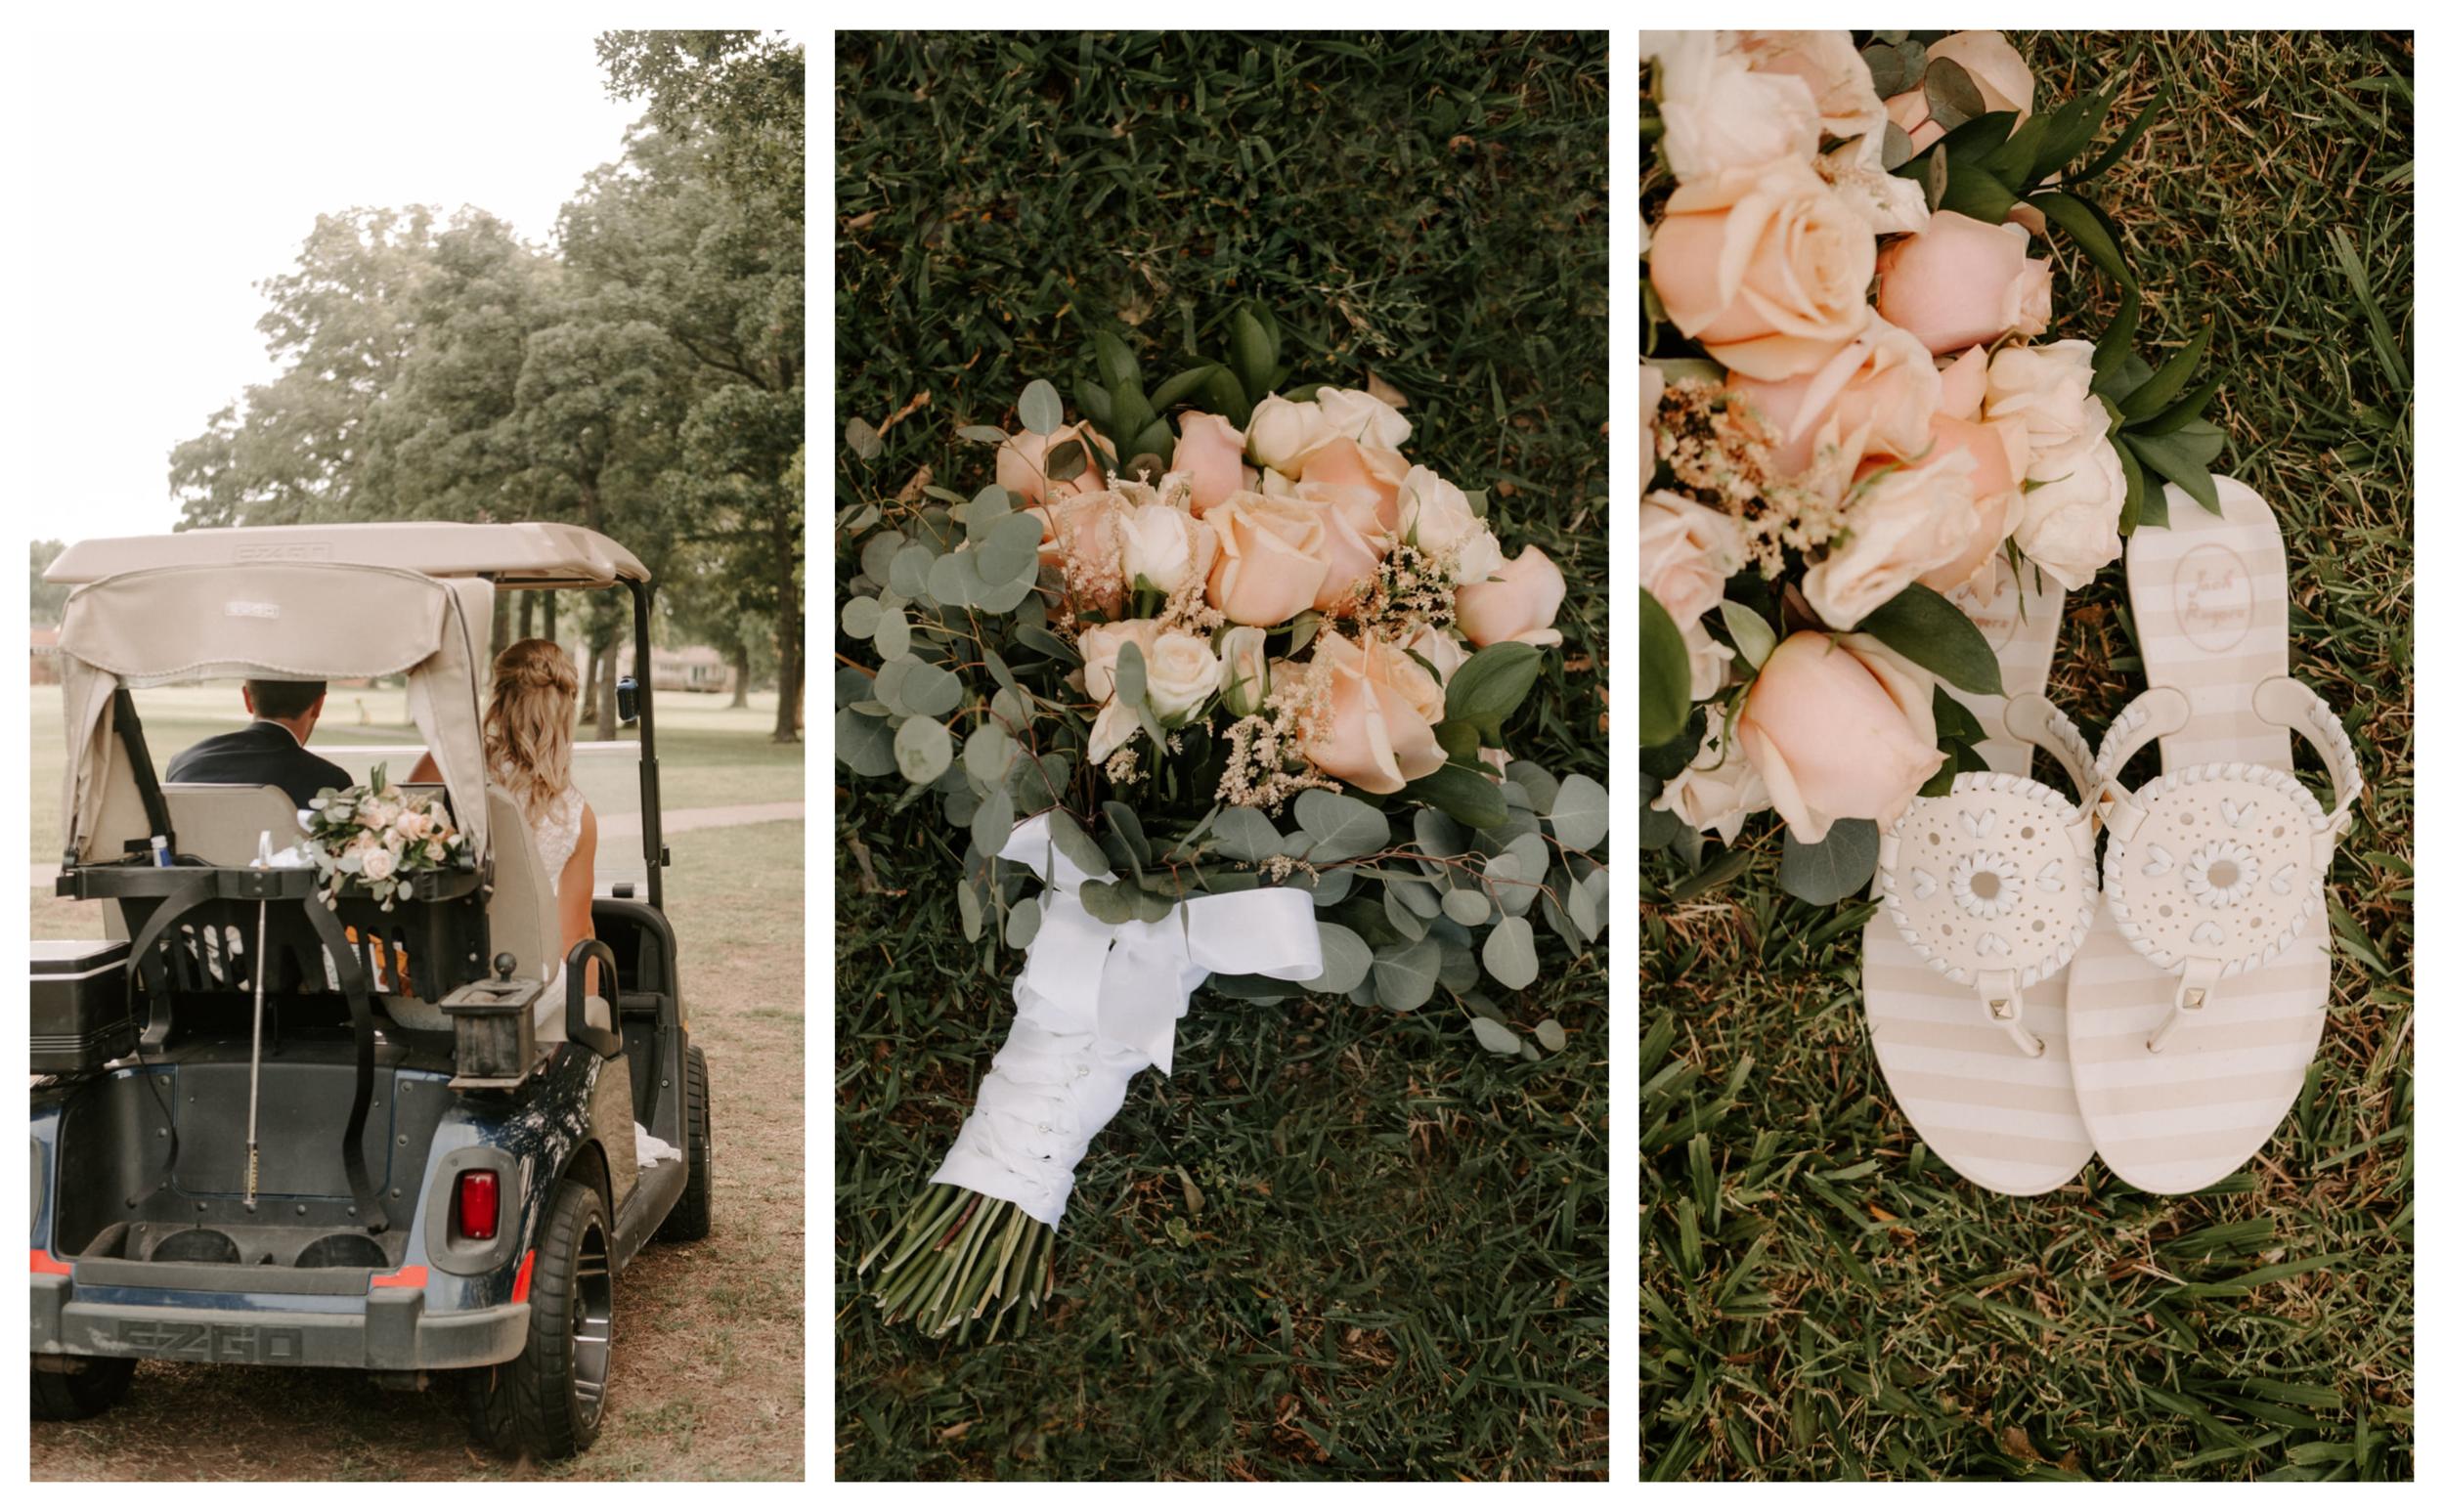 Webster Wedding Blog - Kansas City Bride23